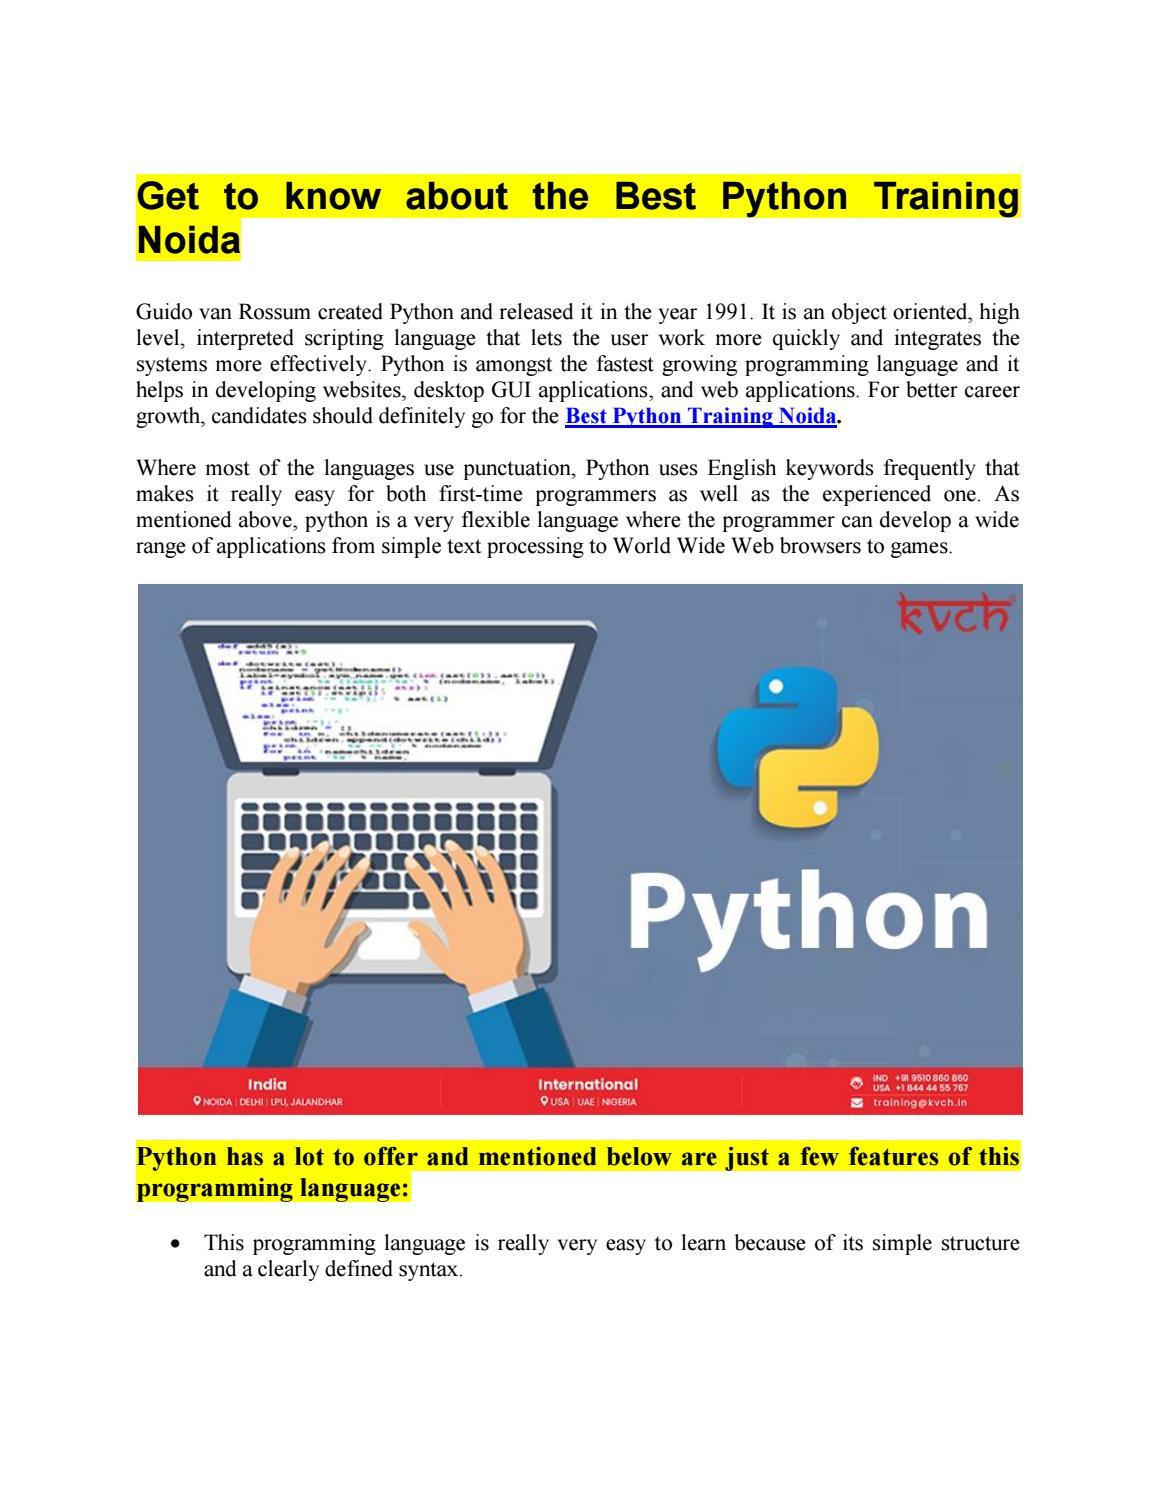 Best Python Training Noida   Python Course in Noida   KVCH by Sonia